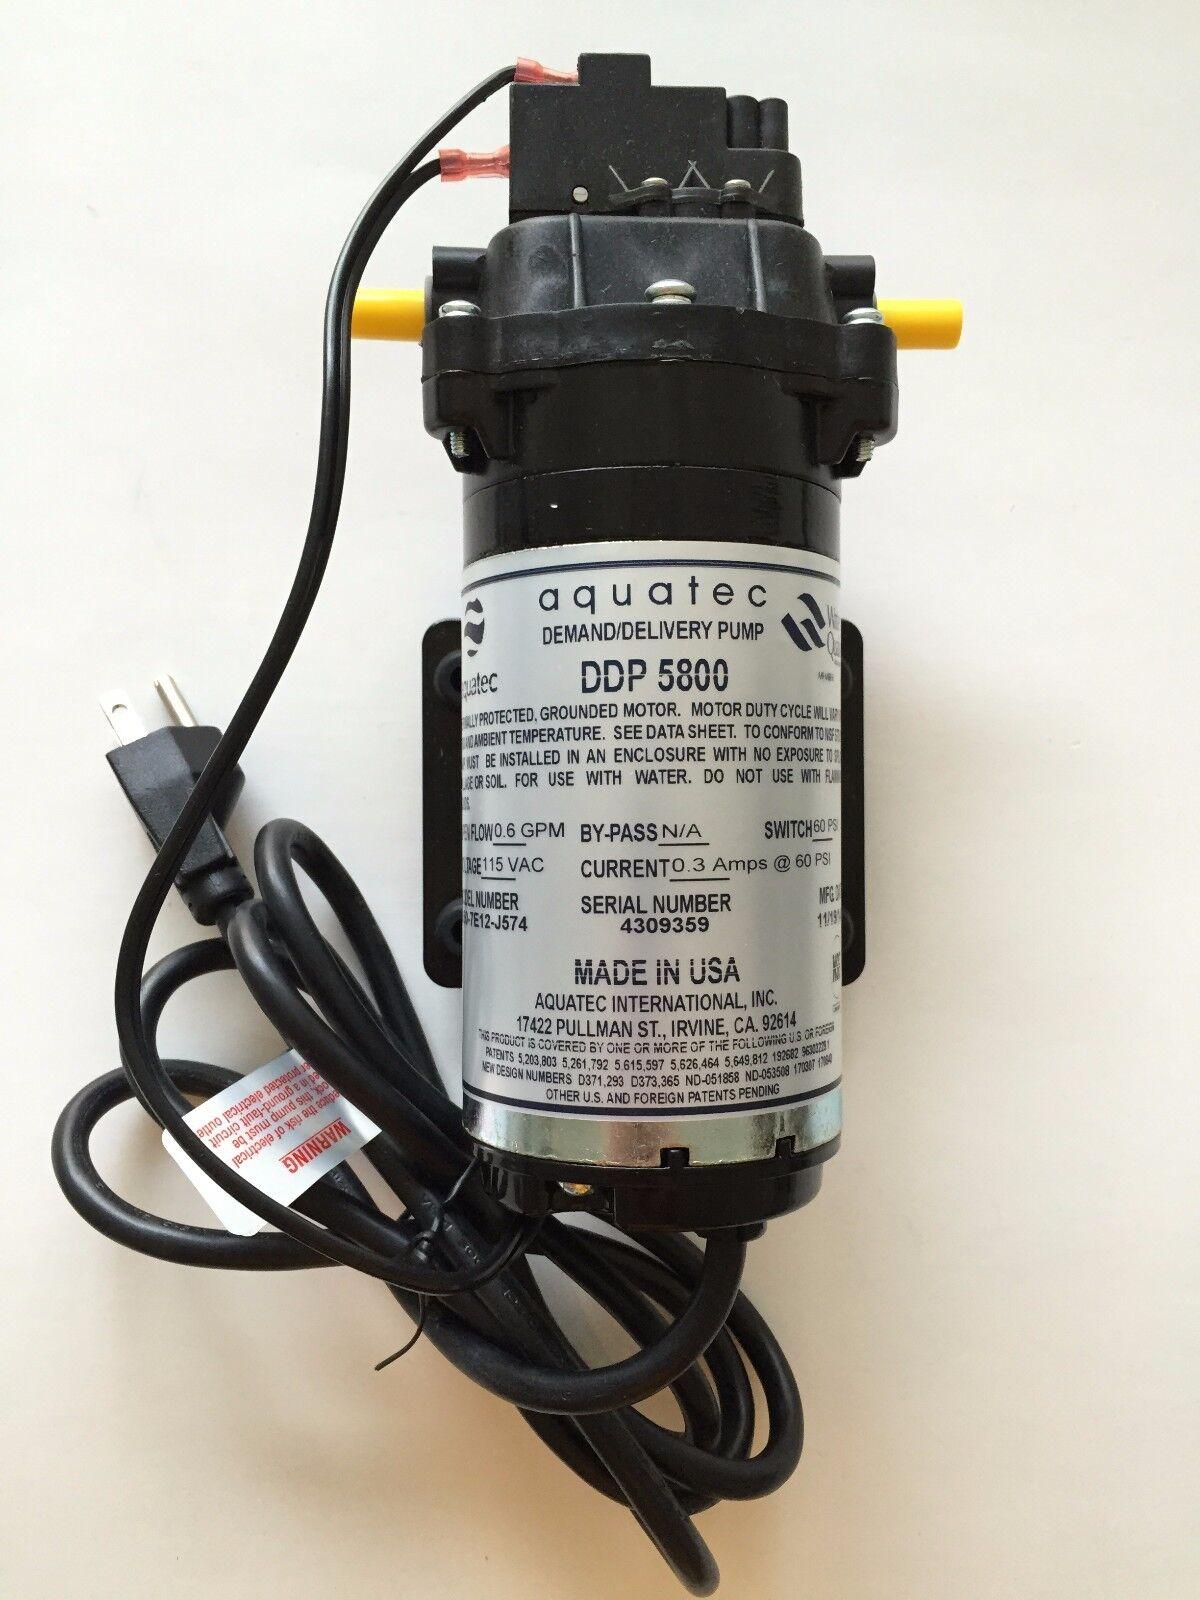 AQUATEC DDP 5850 SERIES Osmose Inverse pompe distributrice 115VAC 5850-7E12-J574